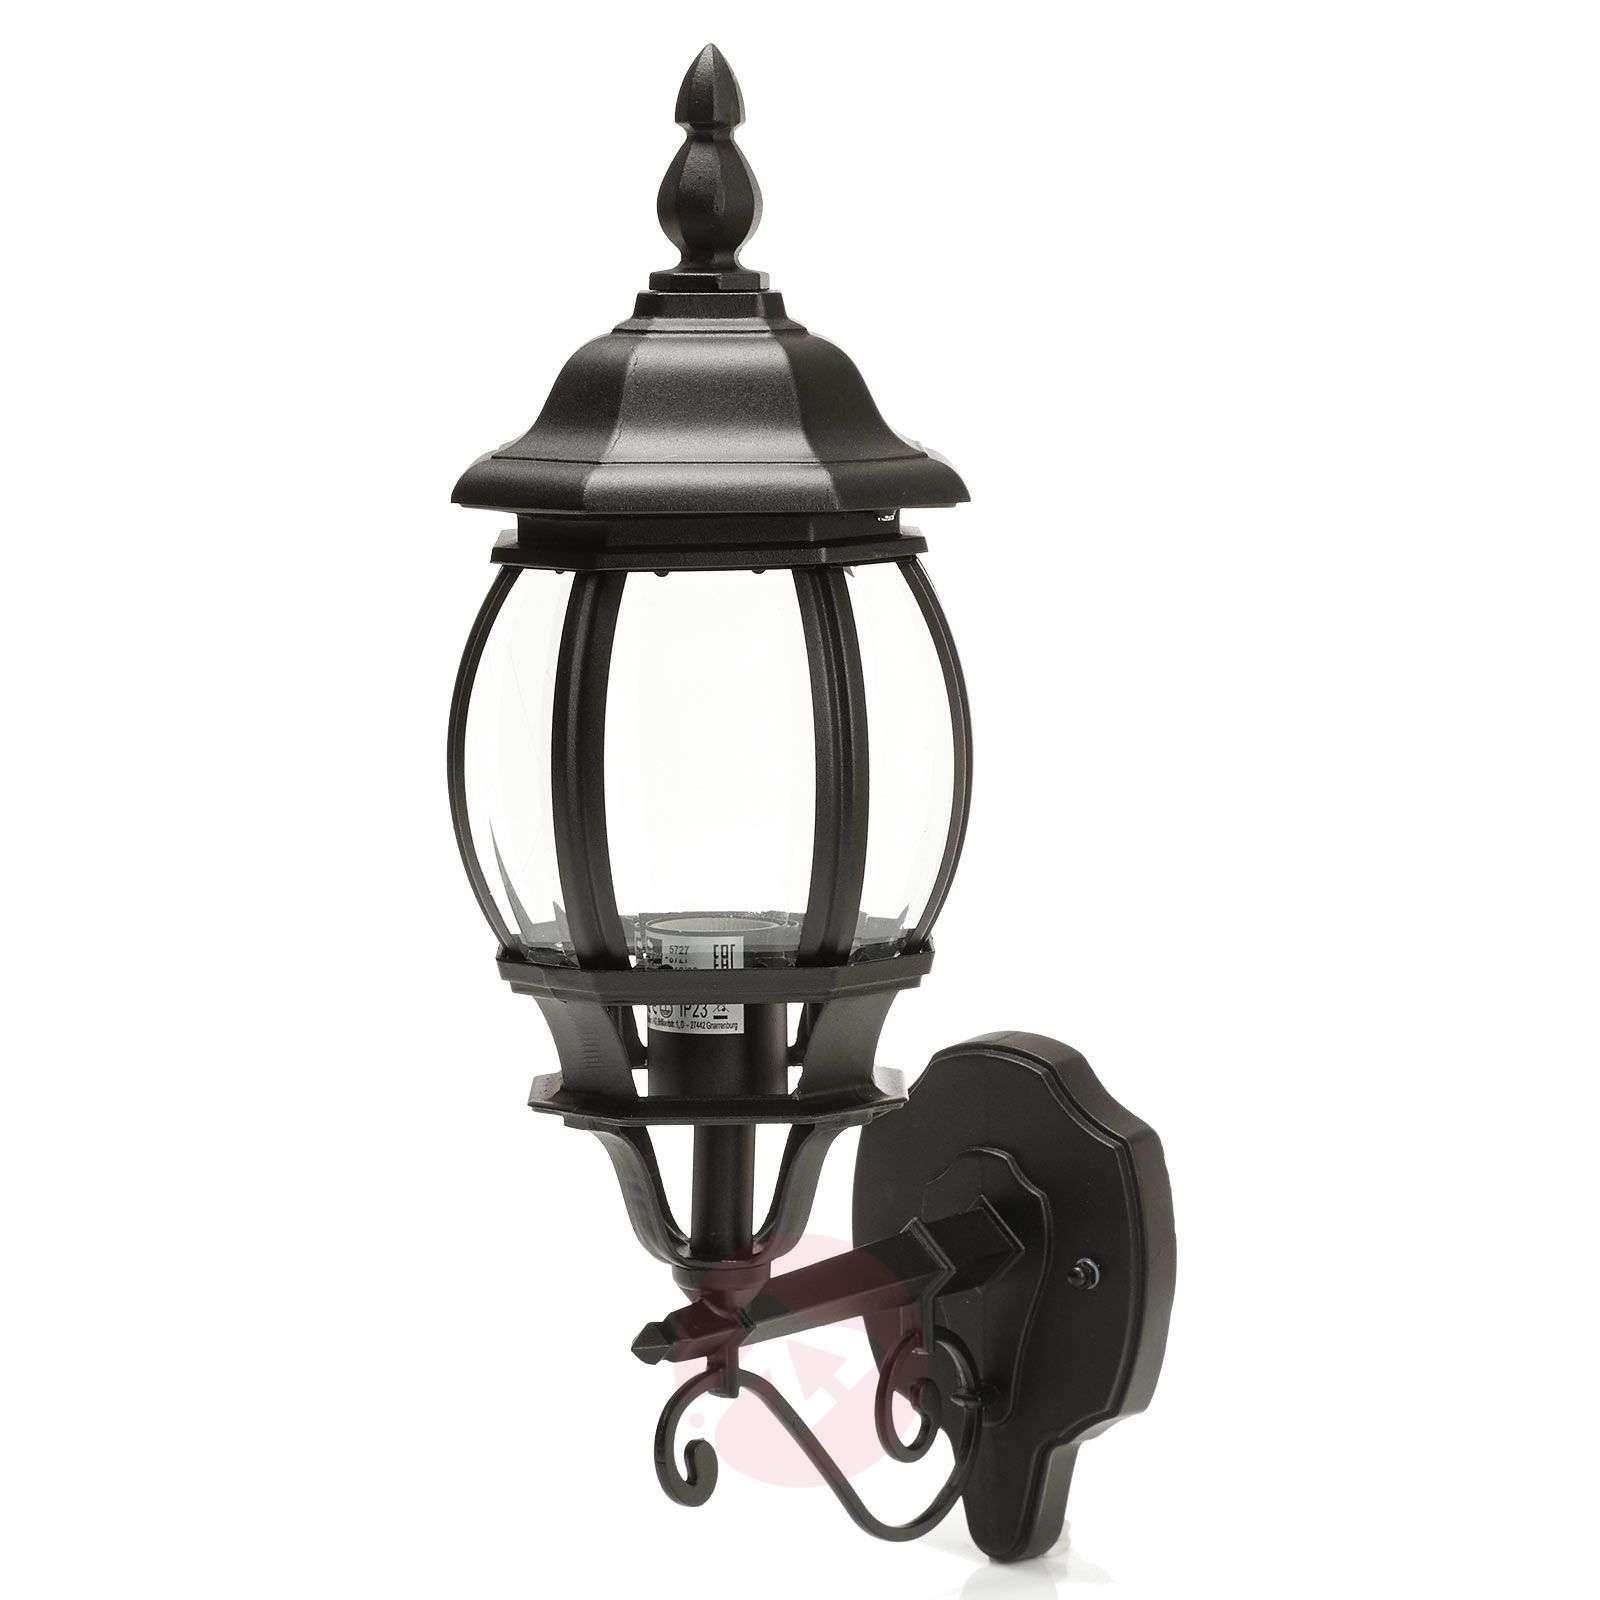 Charming outdoor wall light Istria I black-1507100-01